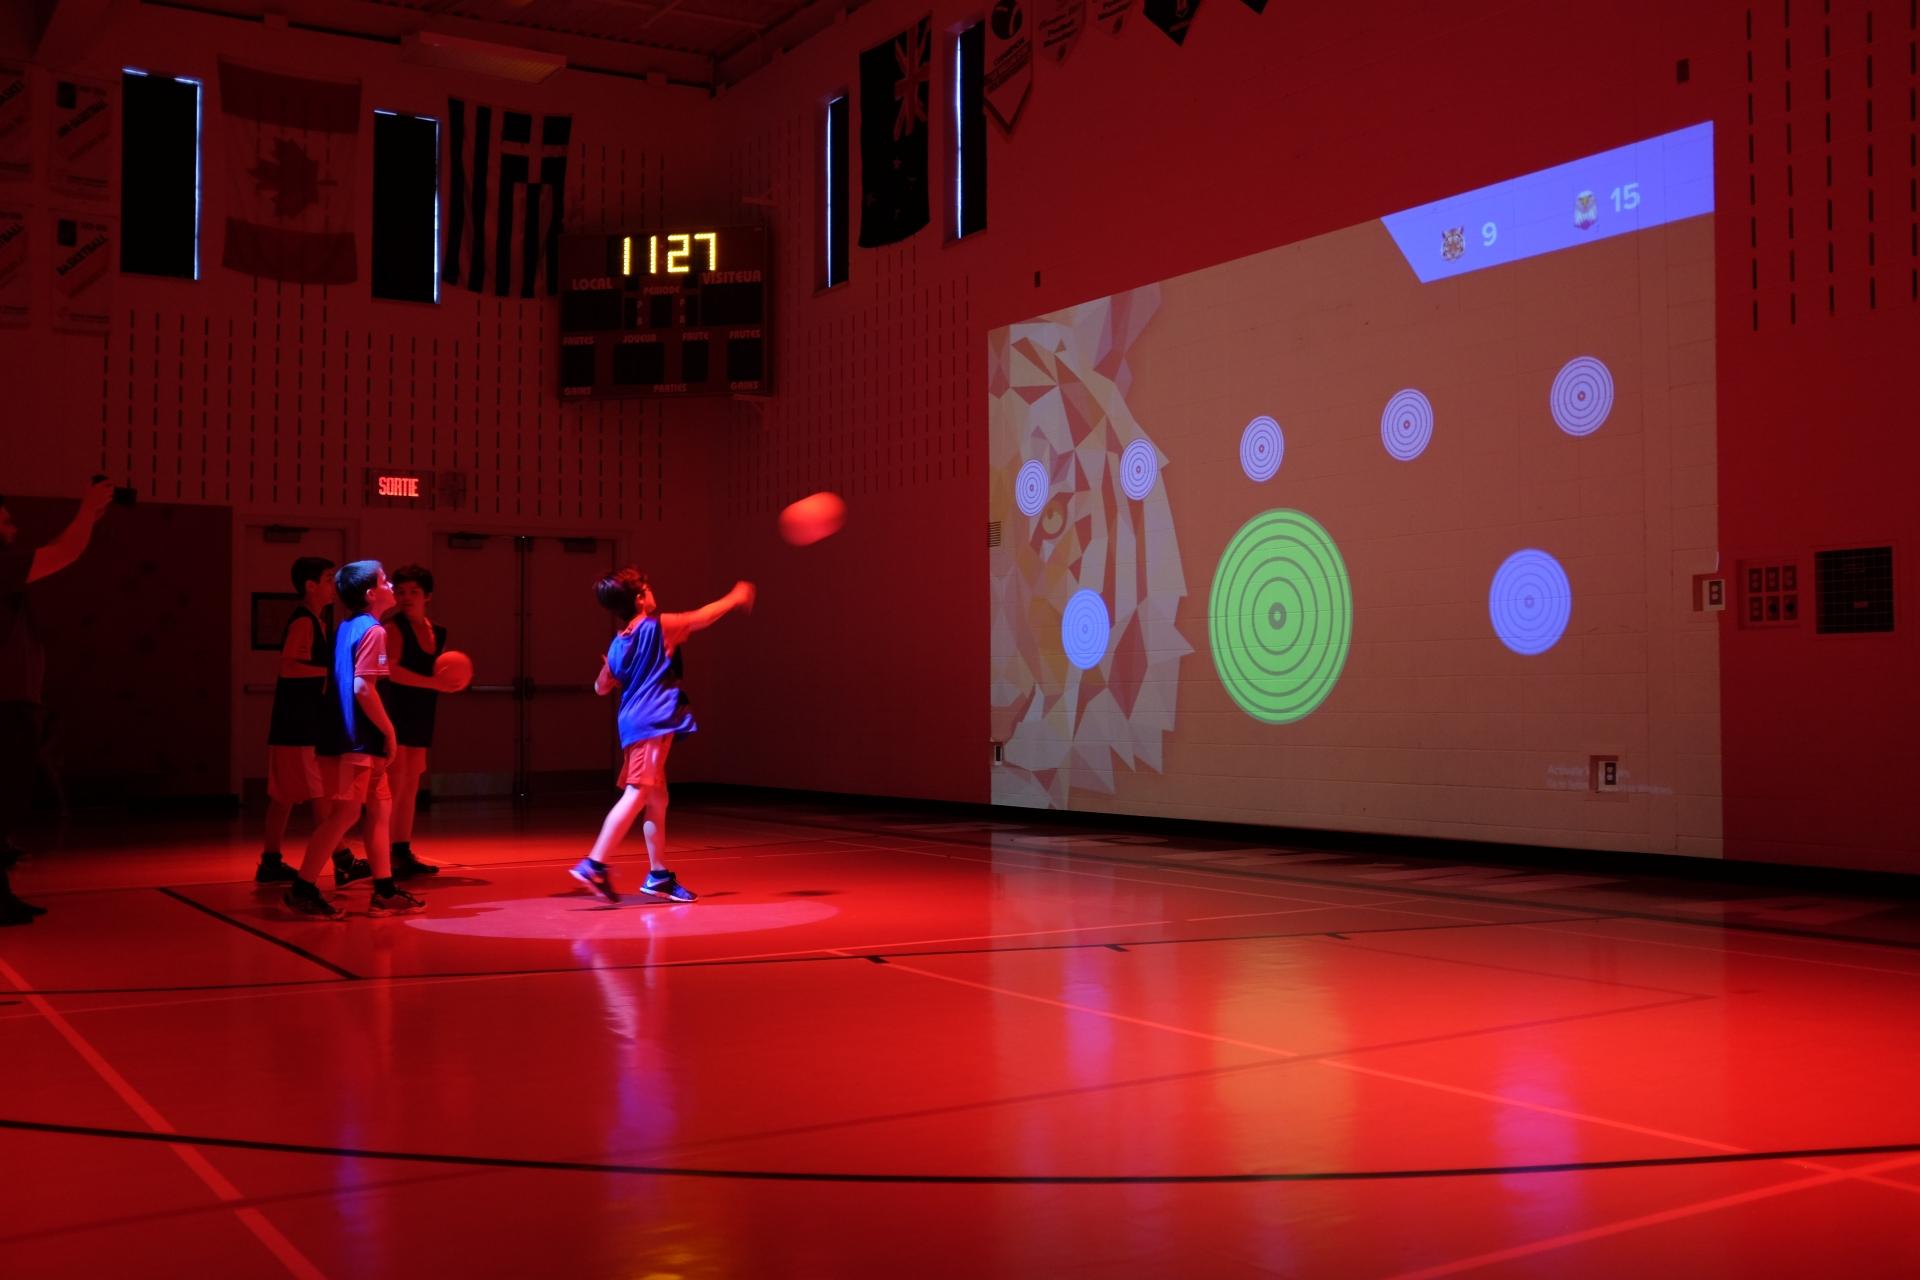 equipementier sportif systeme interactif lu enfants et ballon cible virtuelle